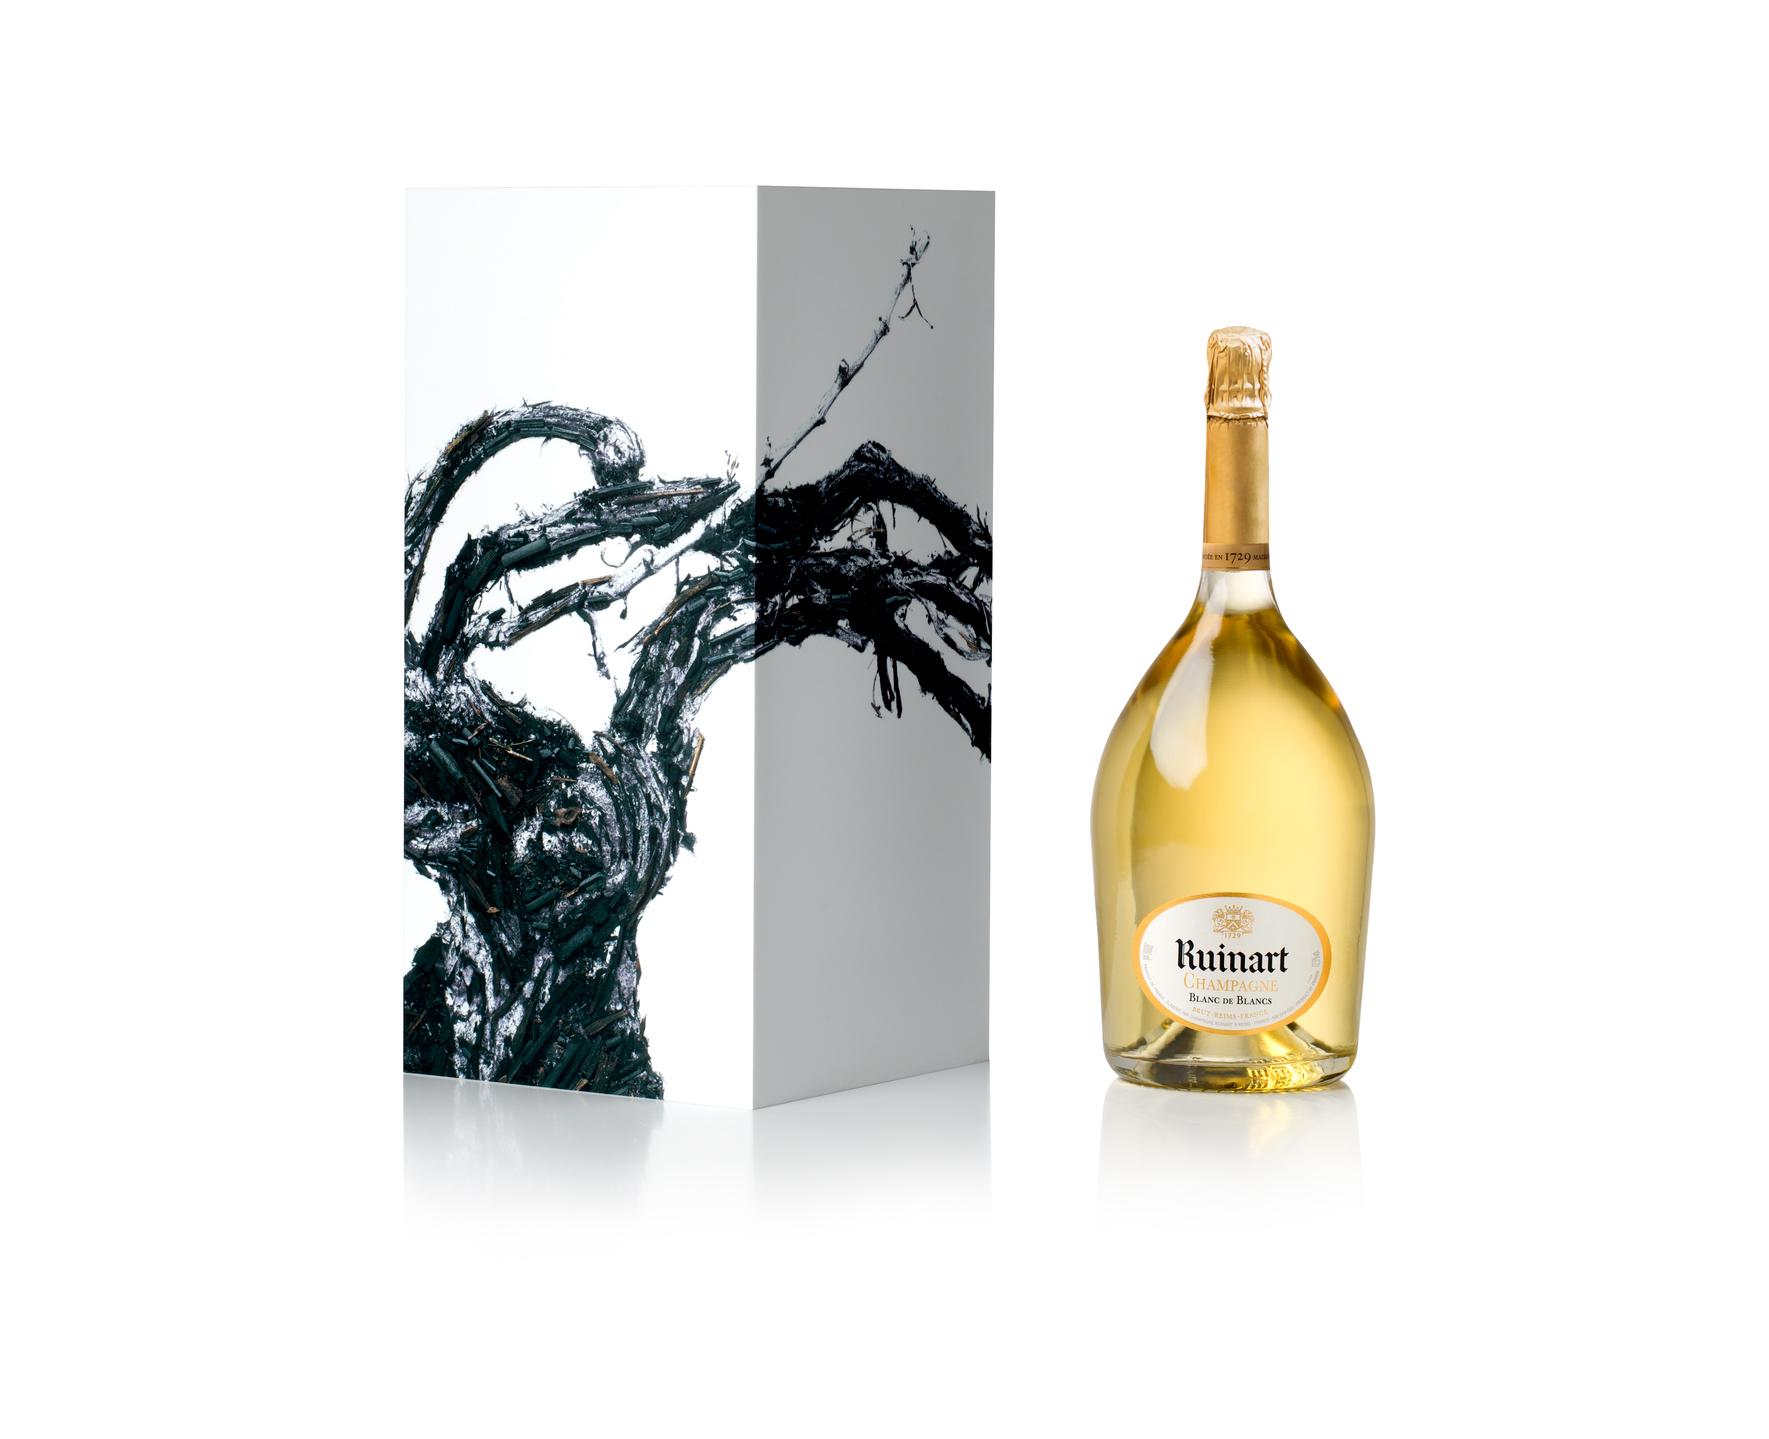 30 garrafas de Ruinart têm obra assinada por Vic Muniz